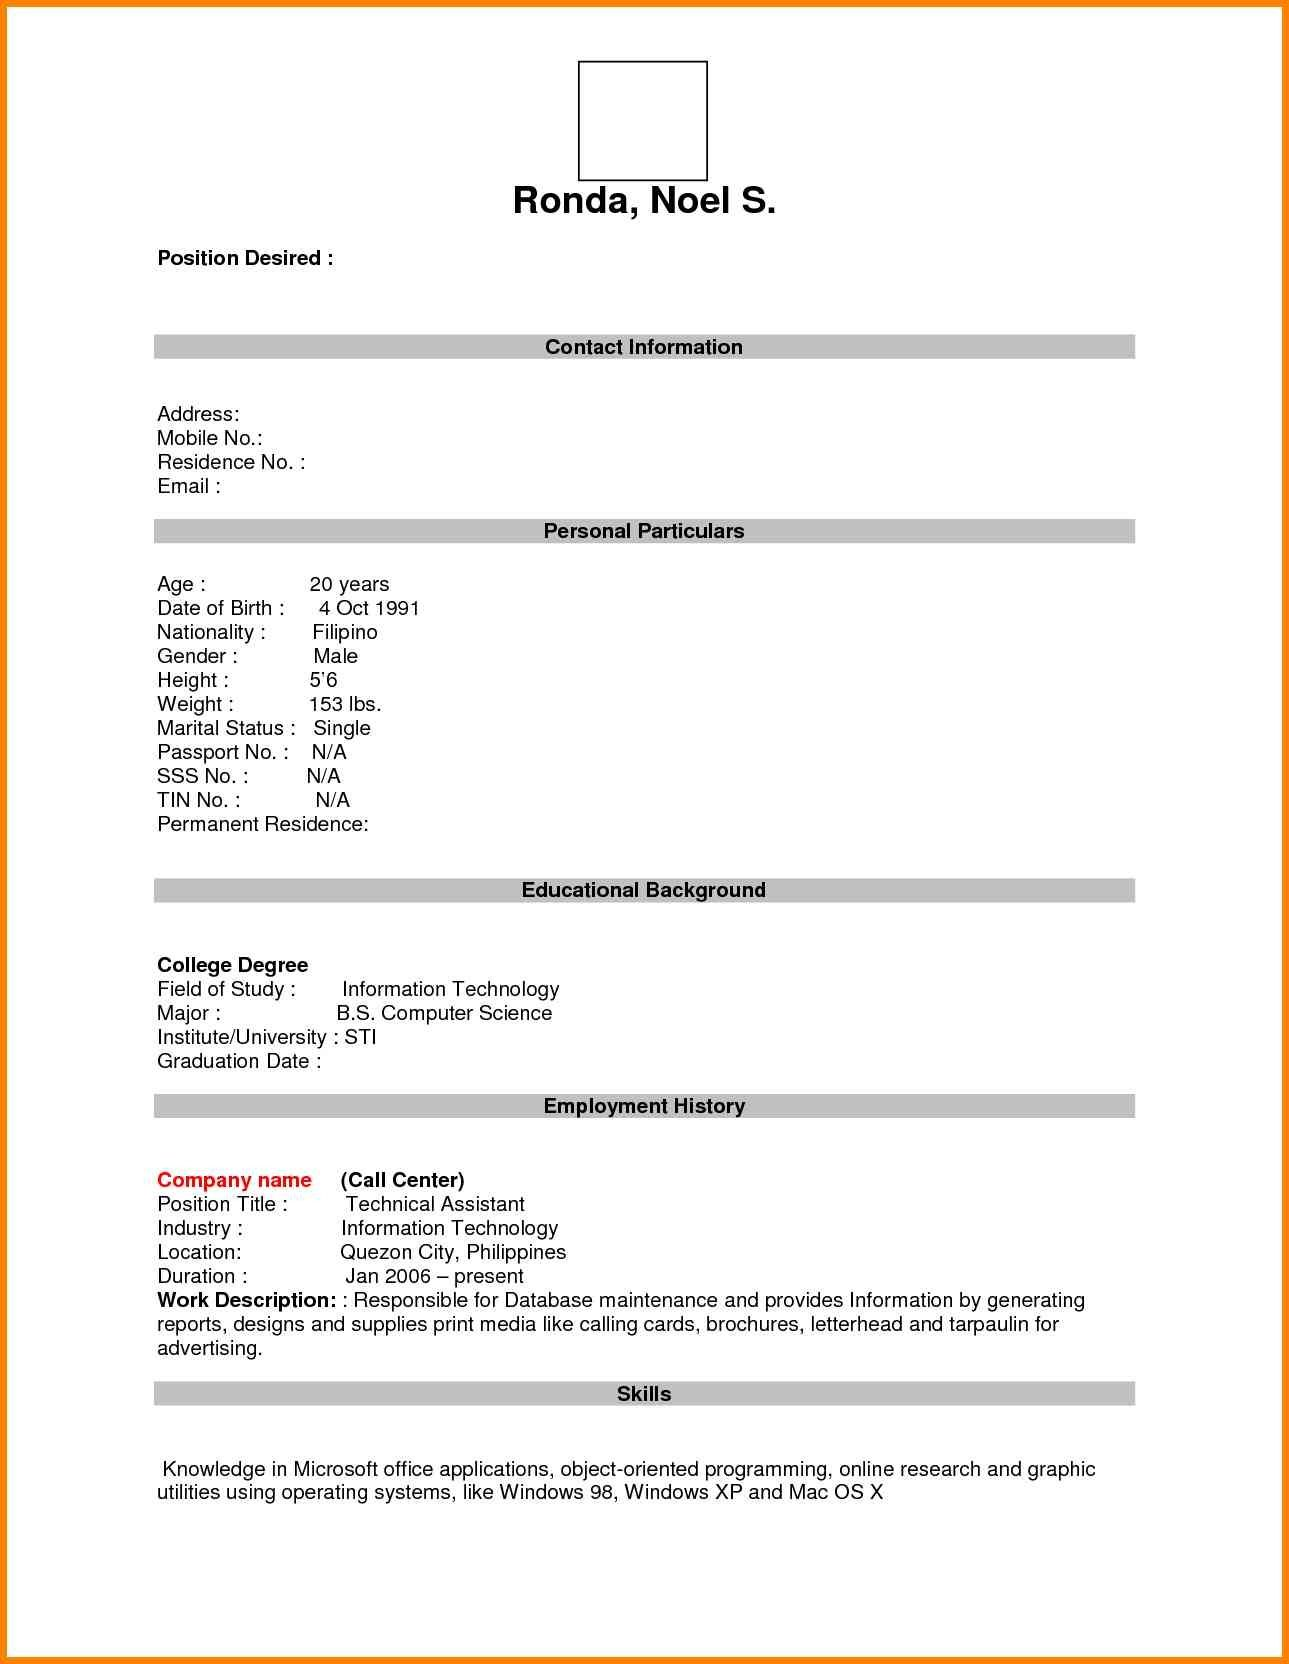 Resume Format Blank Resume Templates Job Resume Template Simple Resume Format Resume Form